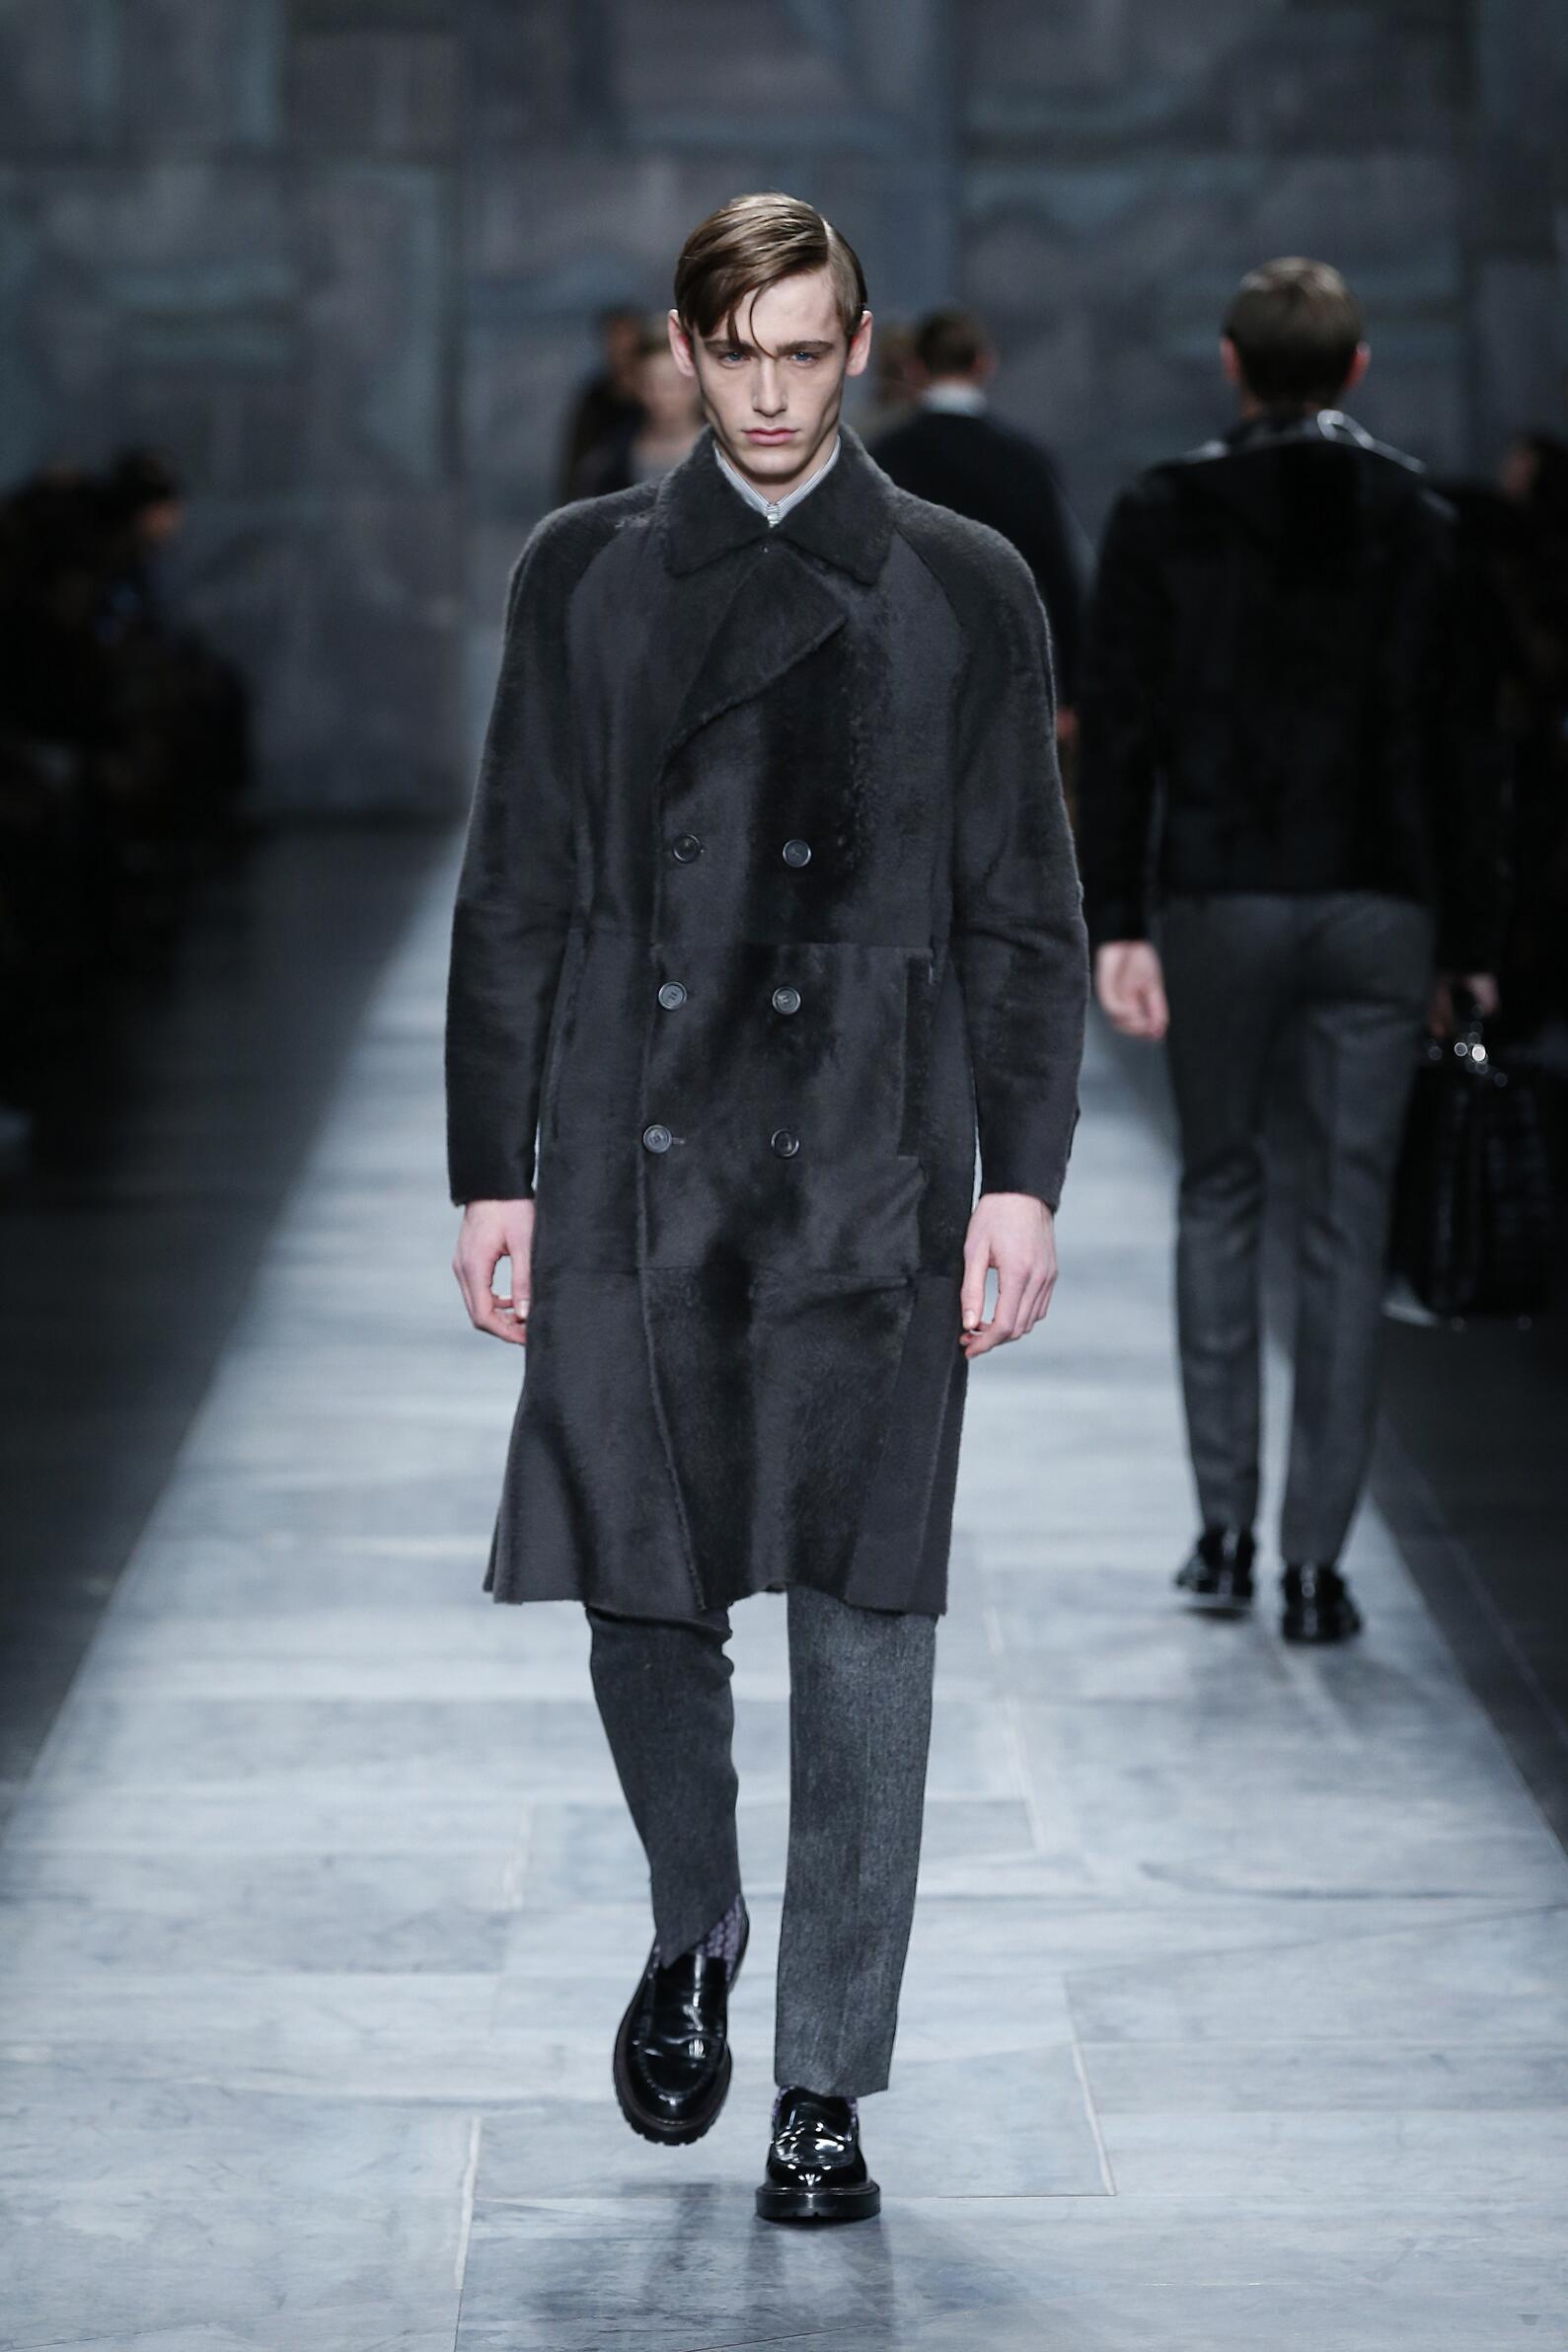 Fashion Model Fendi Collection Catwalk